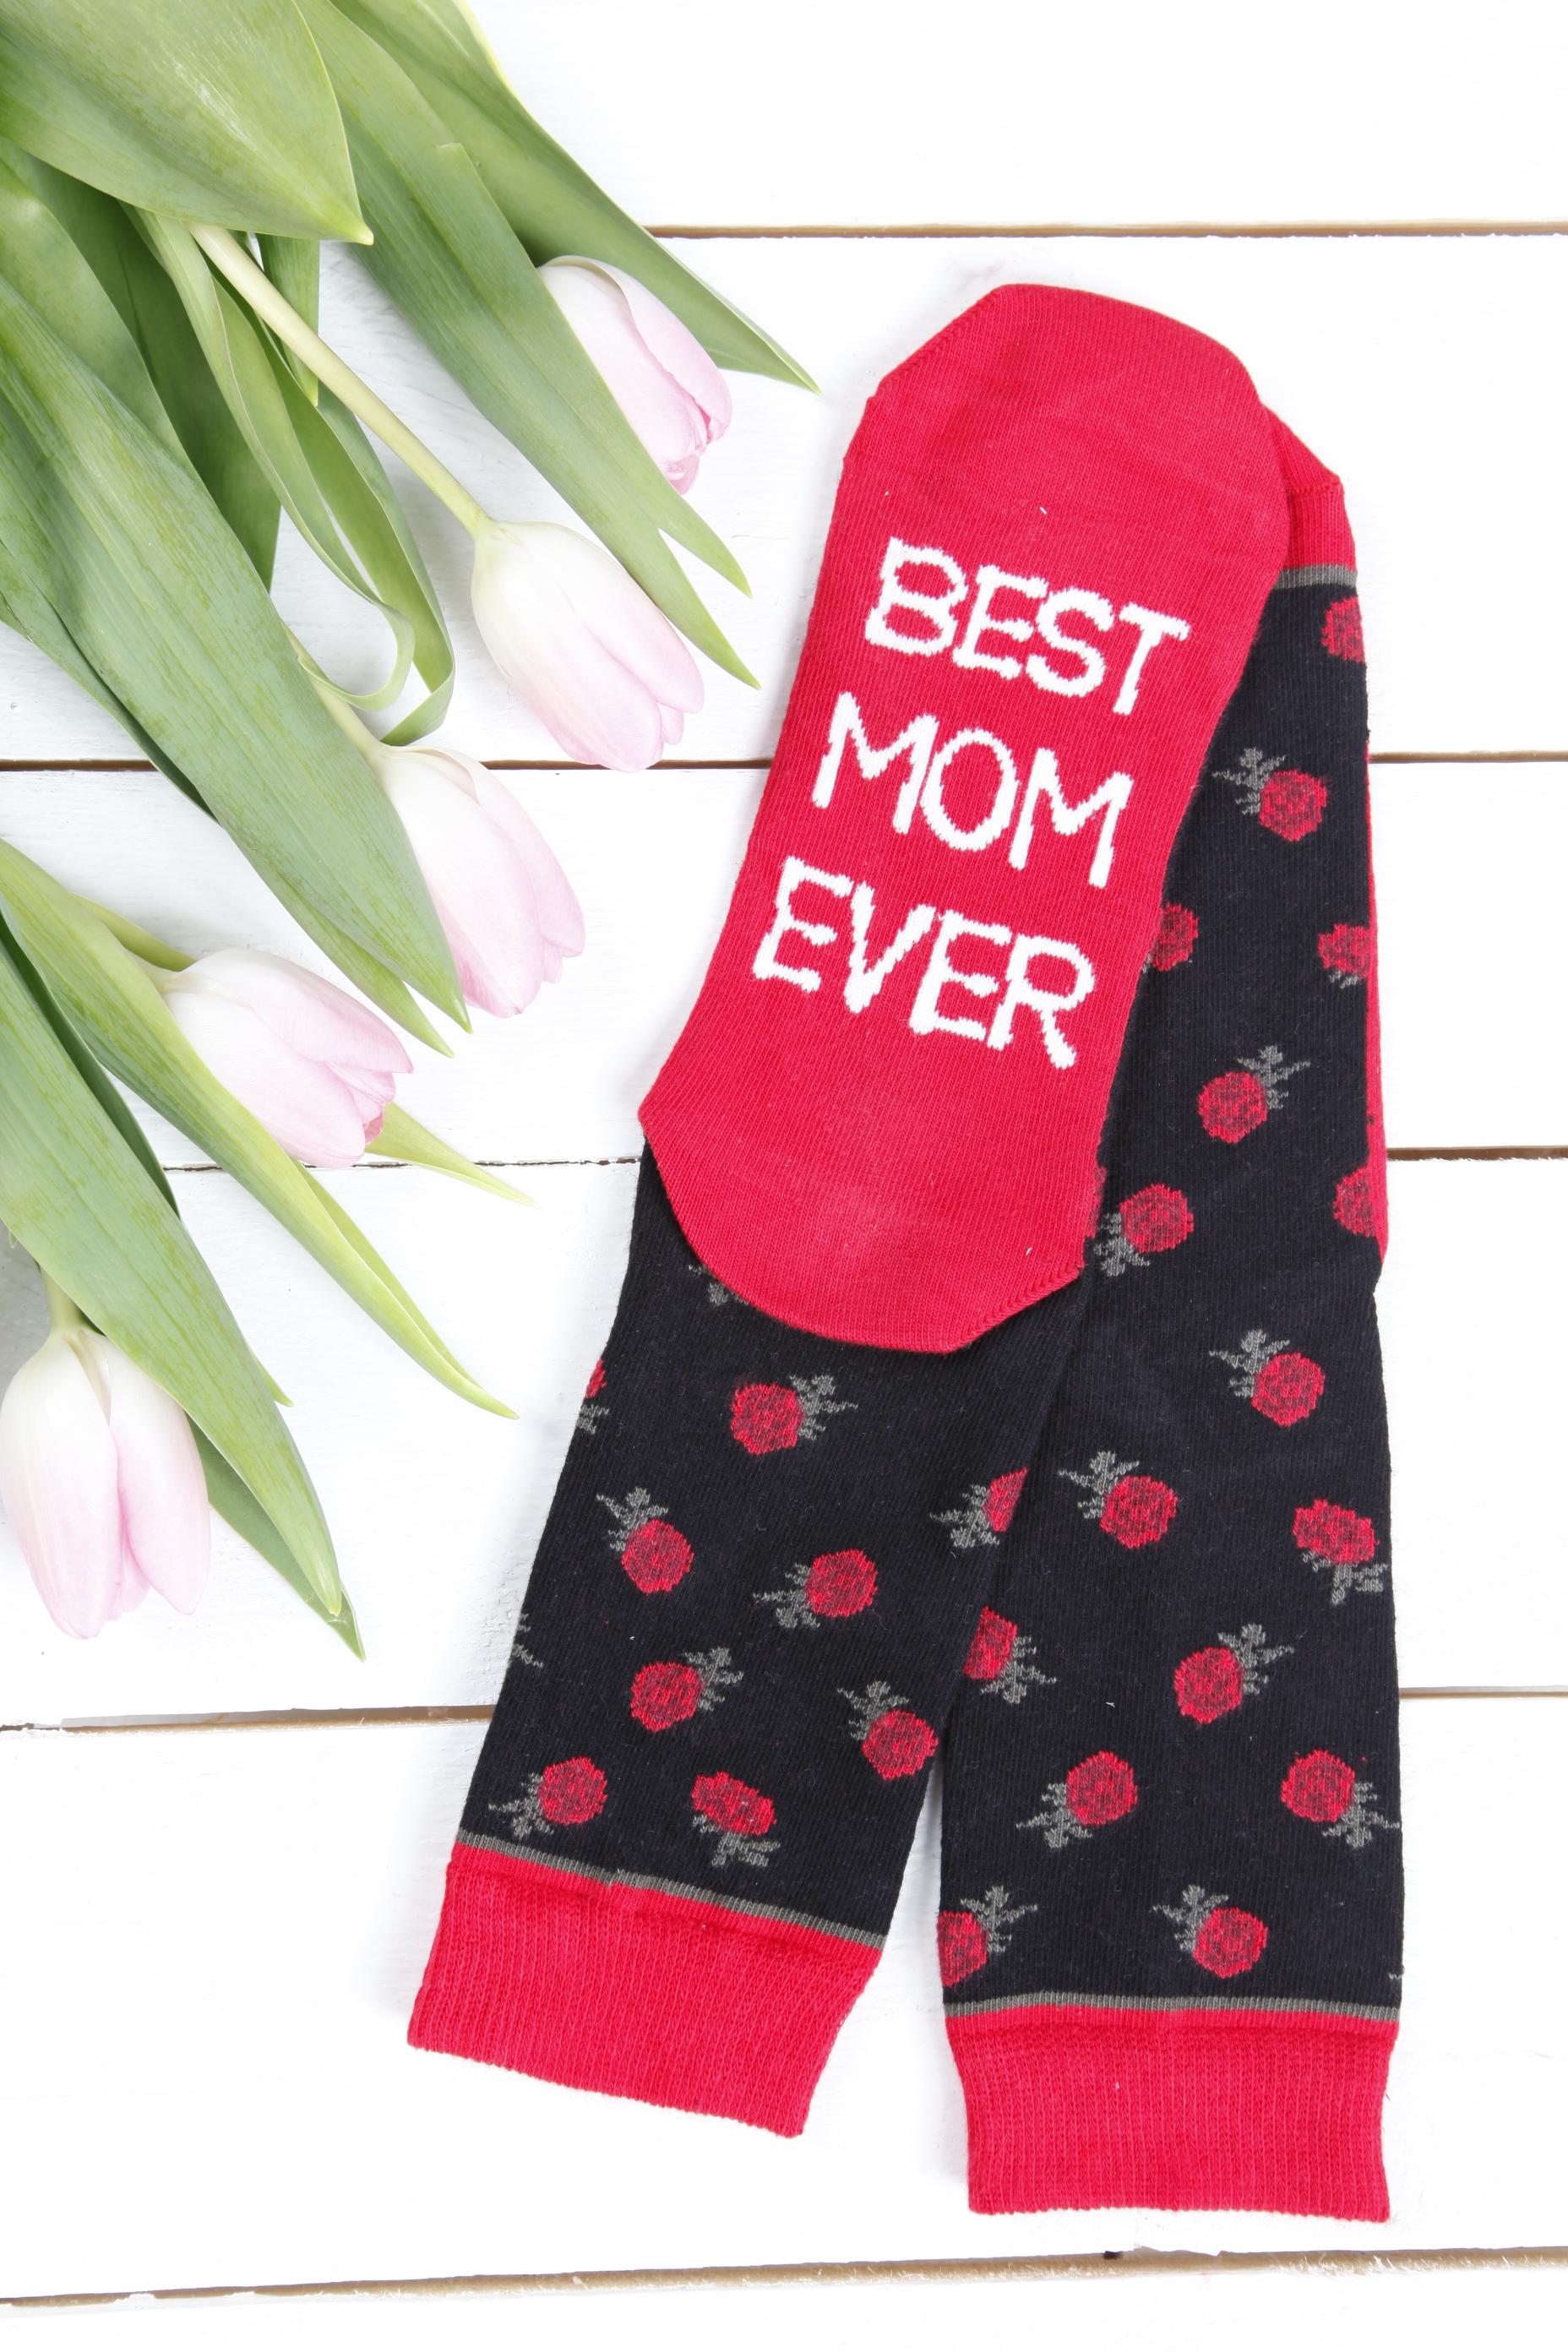 FRANKA socks for beloved mom, red roses pattern